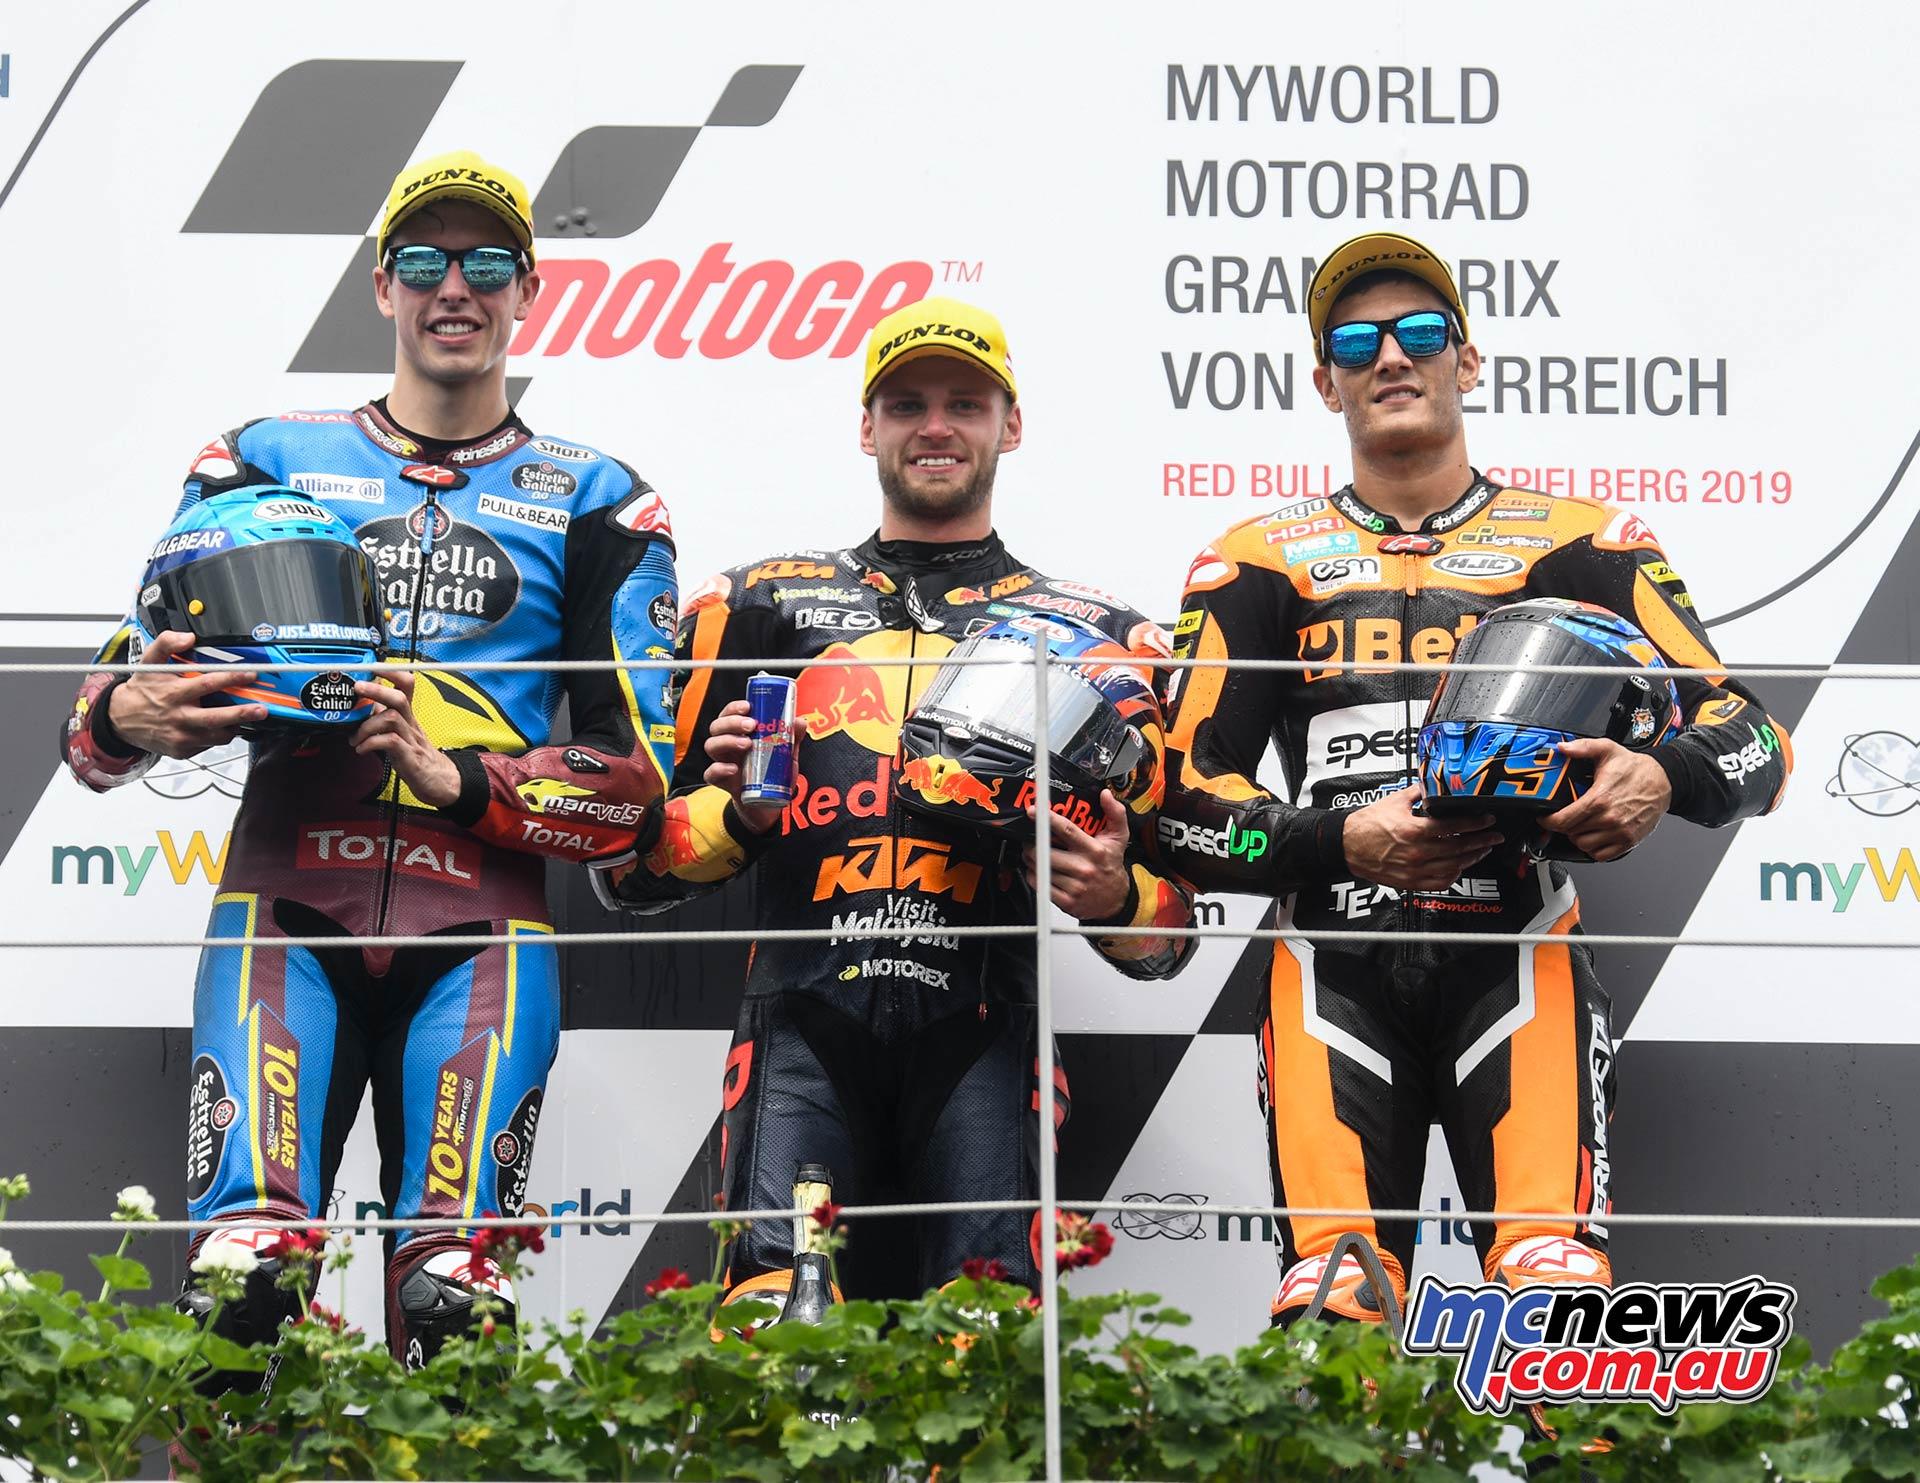 MotoGP Rnd RedBullRing Race Moto Marquez Binder Navarro